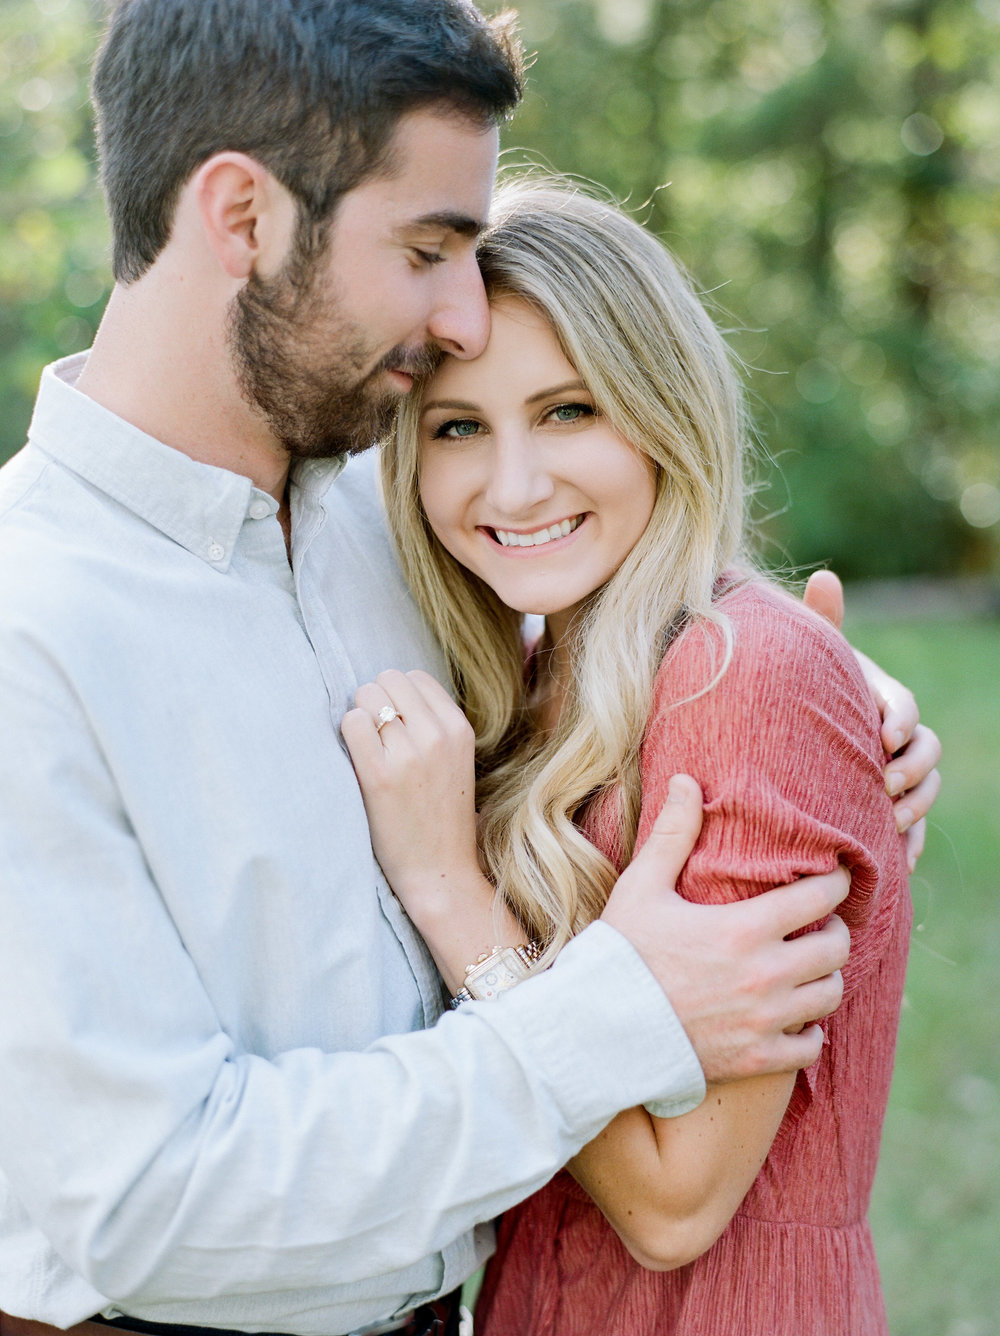 Houston-Wedding-Photographer-Best-Top-Luxury-Destination-Engagements-Portrait-Austin-Photography-6.jpg